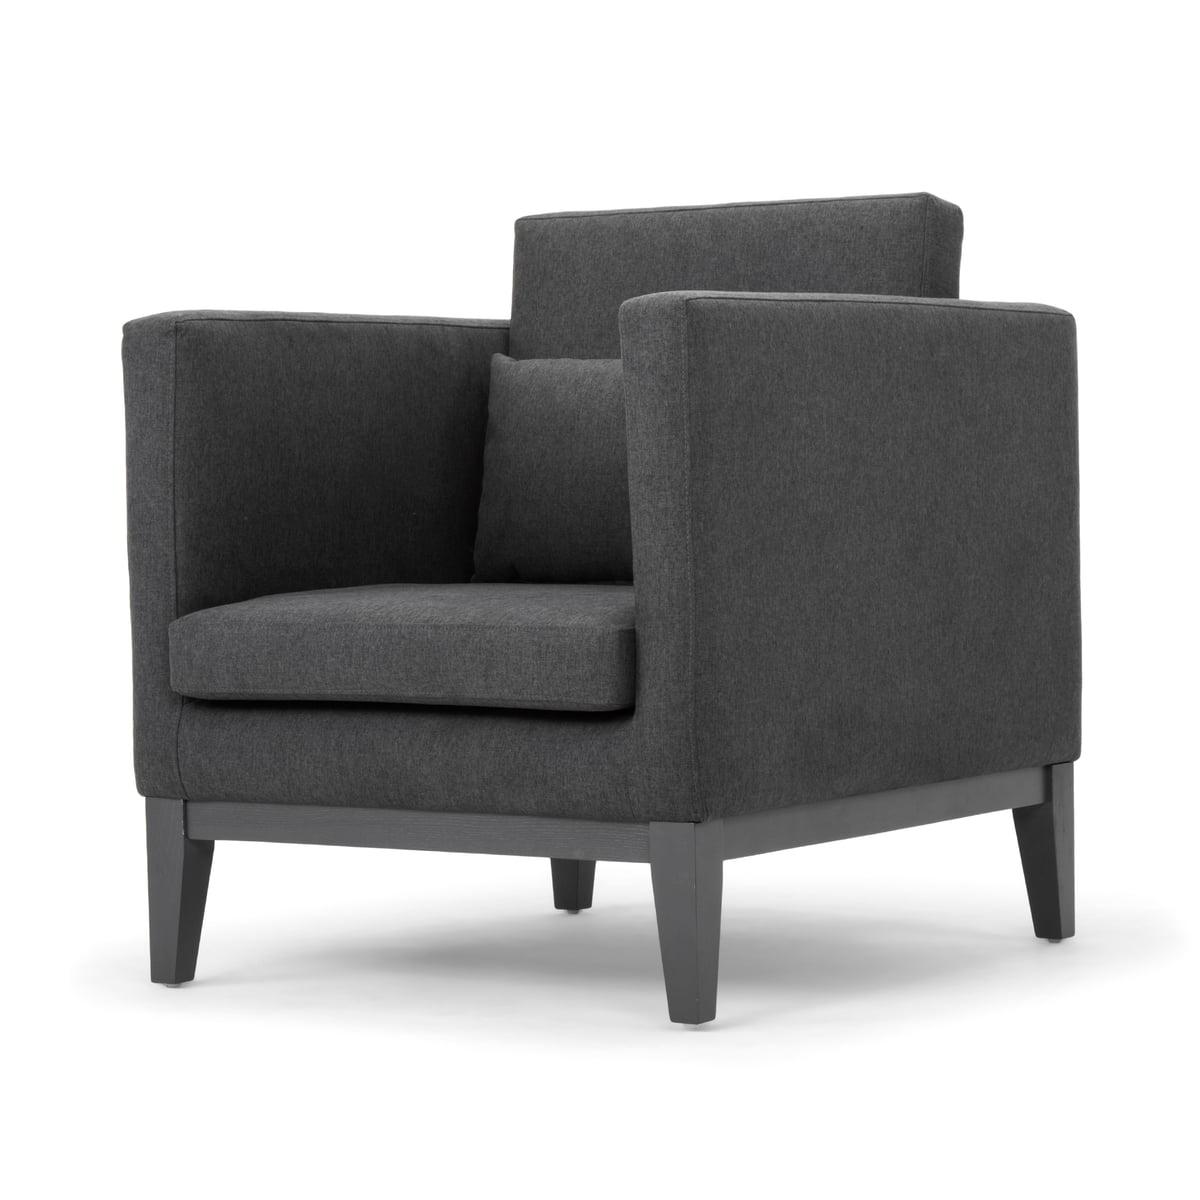 Day Dream Sessel Von Design House Stockholm Connox